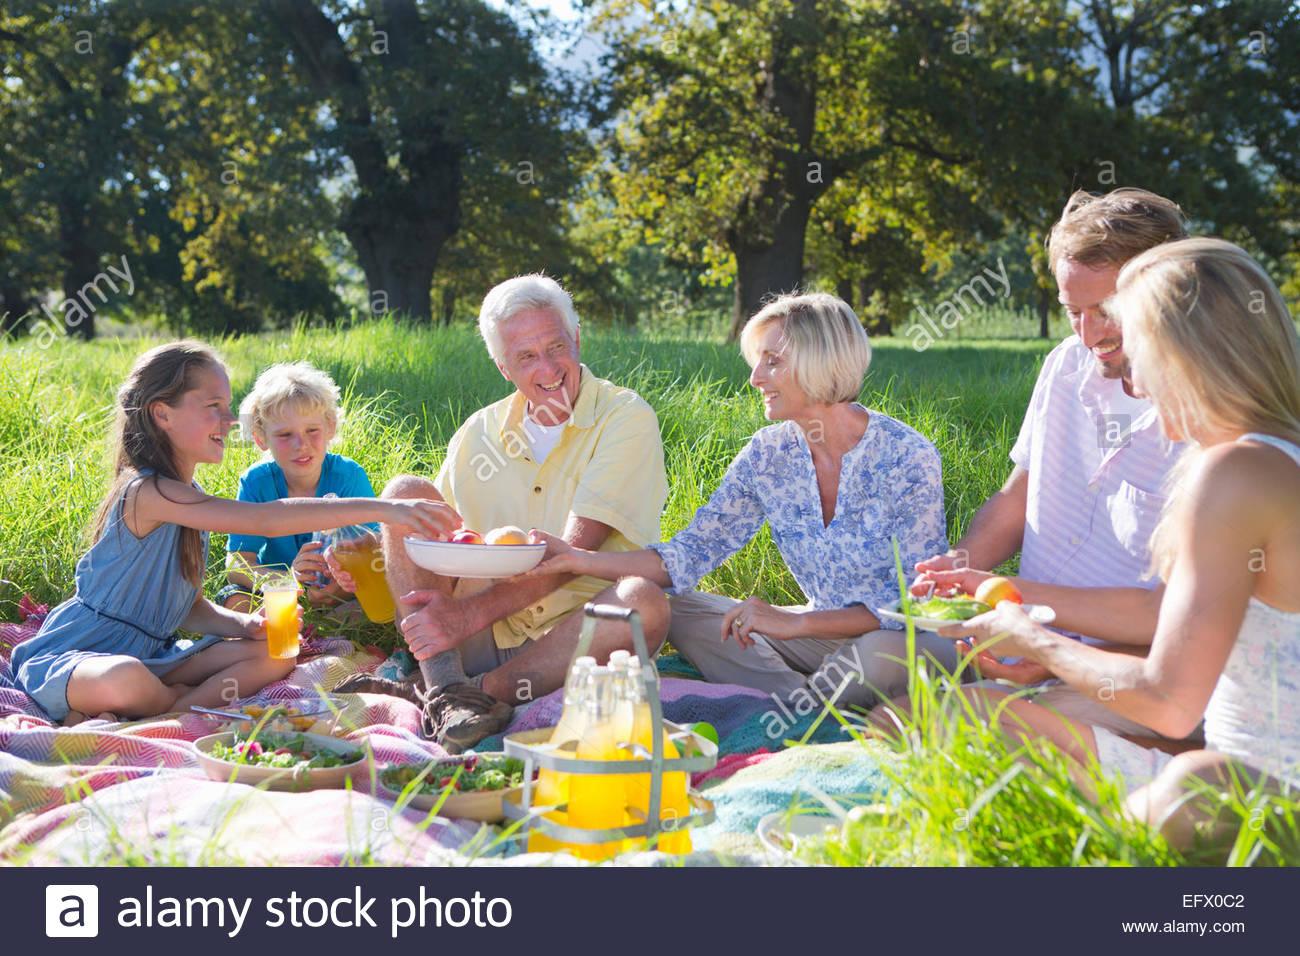 Multi generation having picnic in treelined field - Stock Image